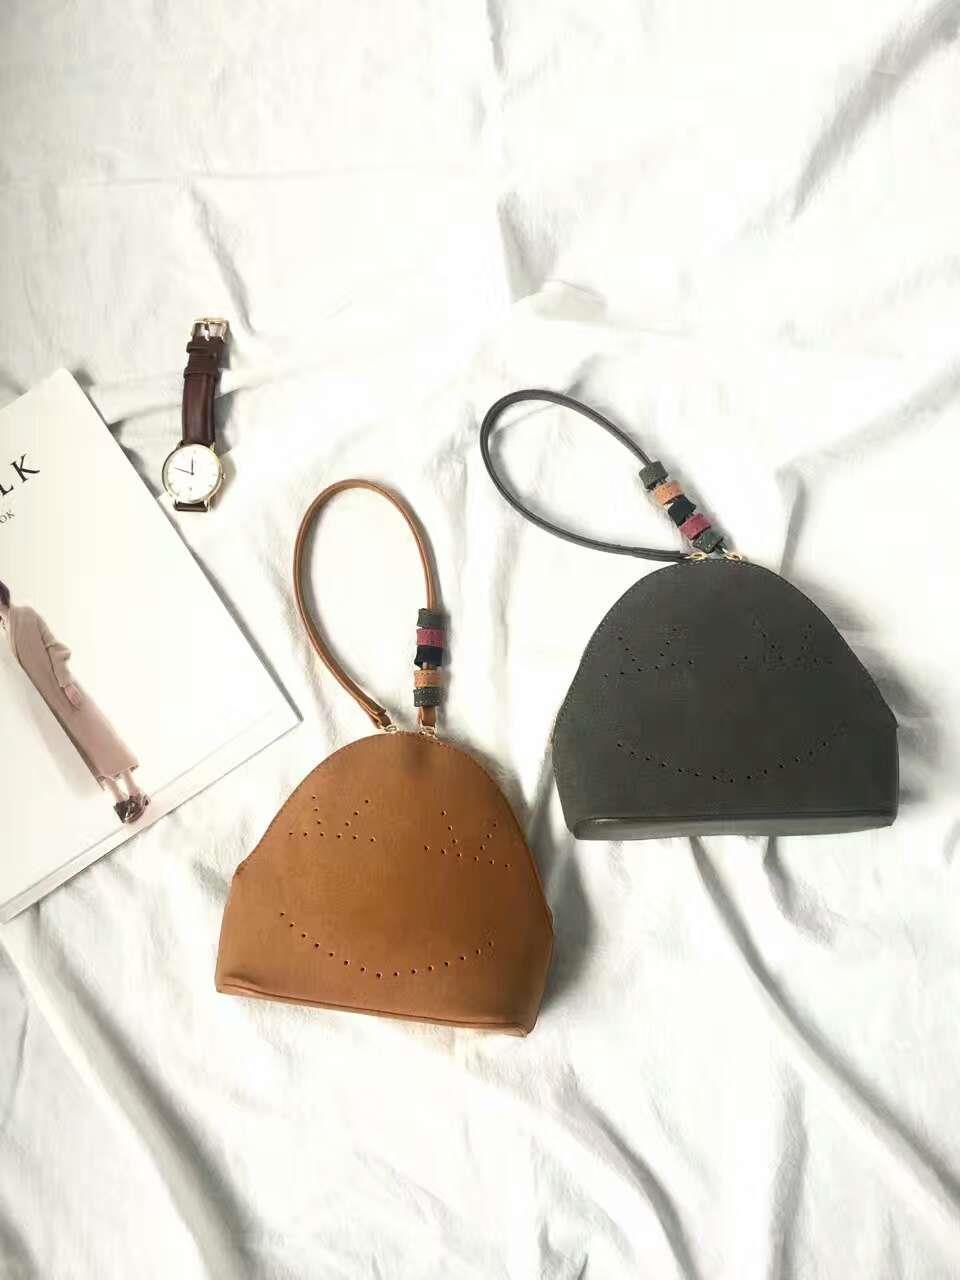 15731d826c Korea Ladies Fashion Dinner Handbag Vintage Small Bag RYF3383